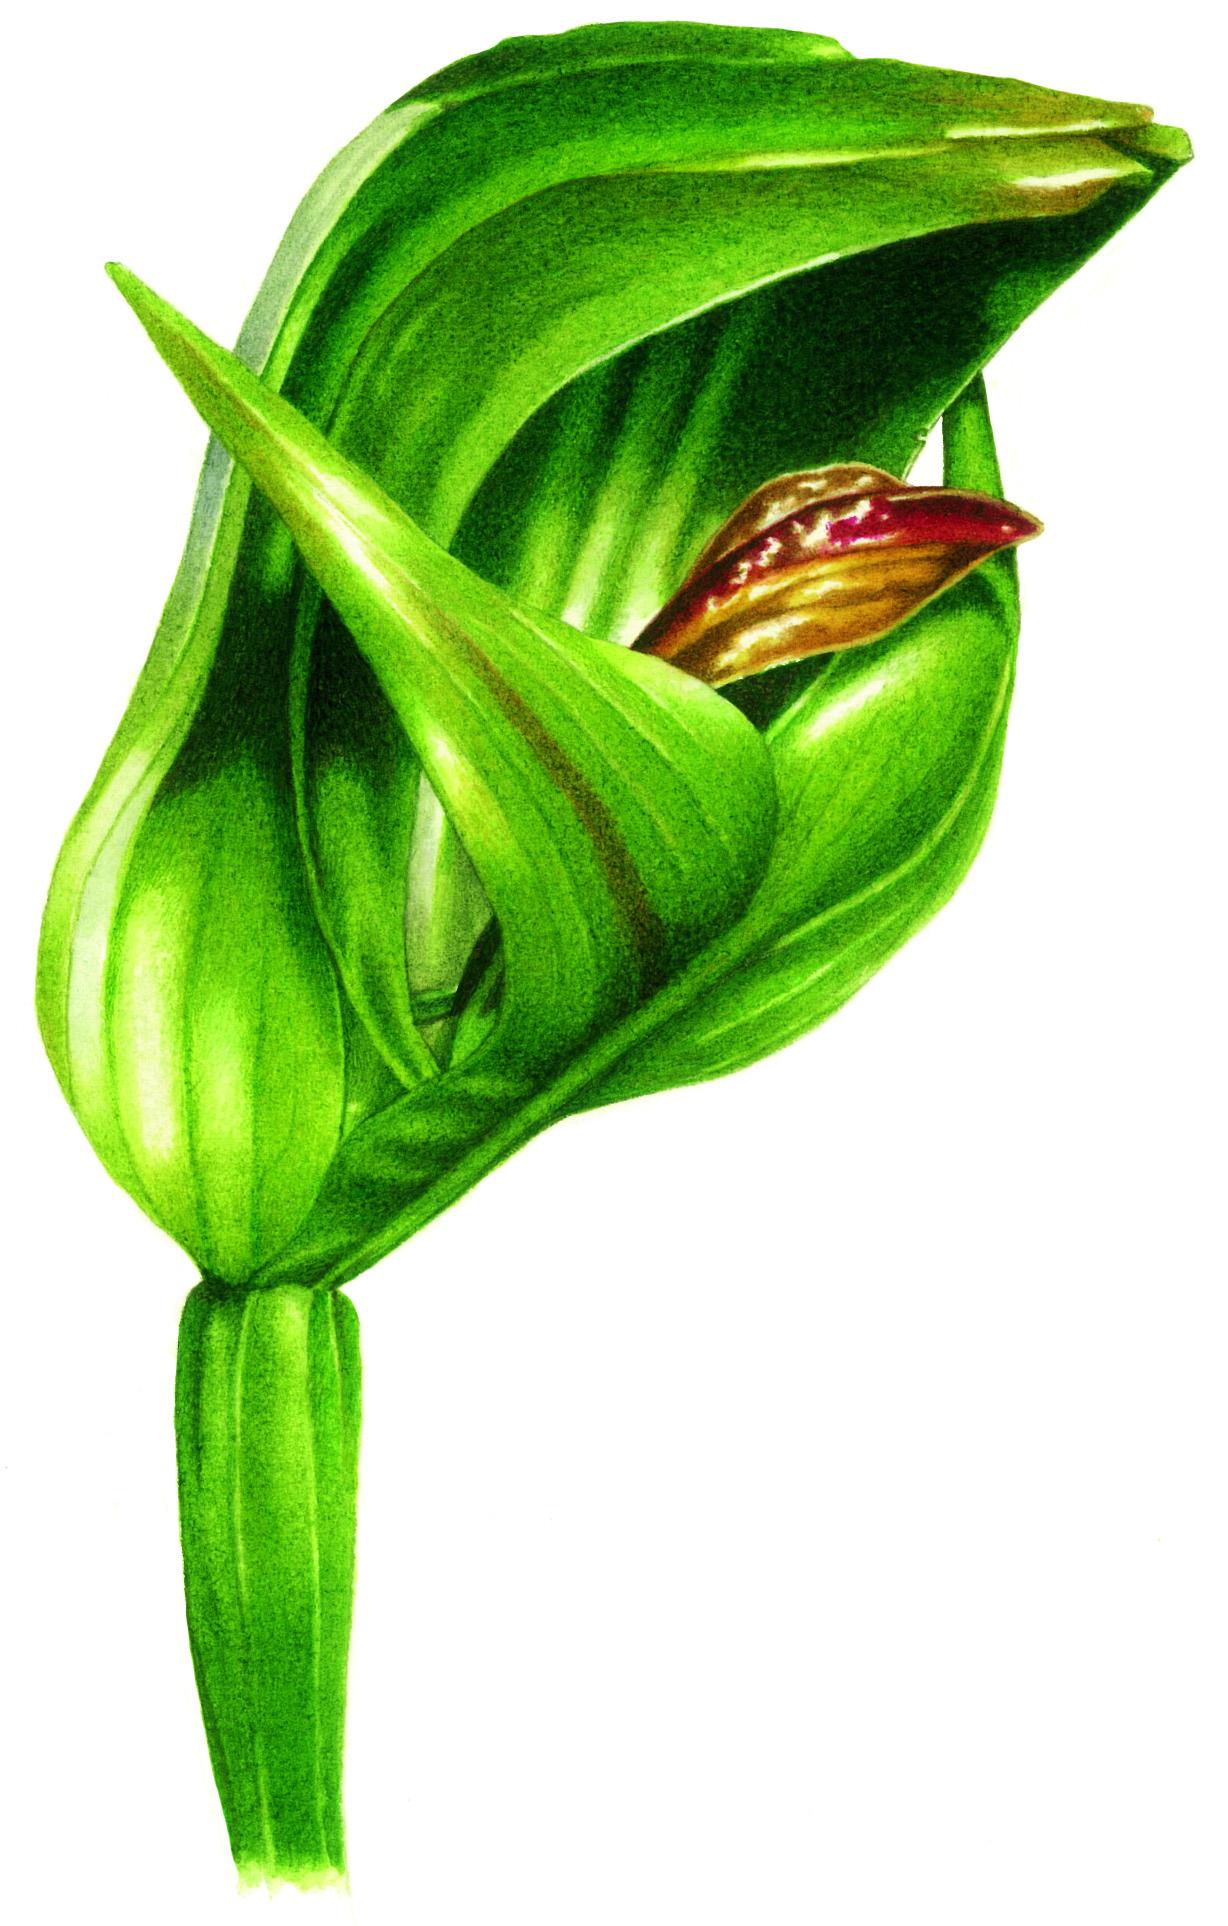 Australian orchids